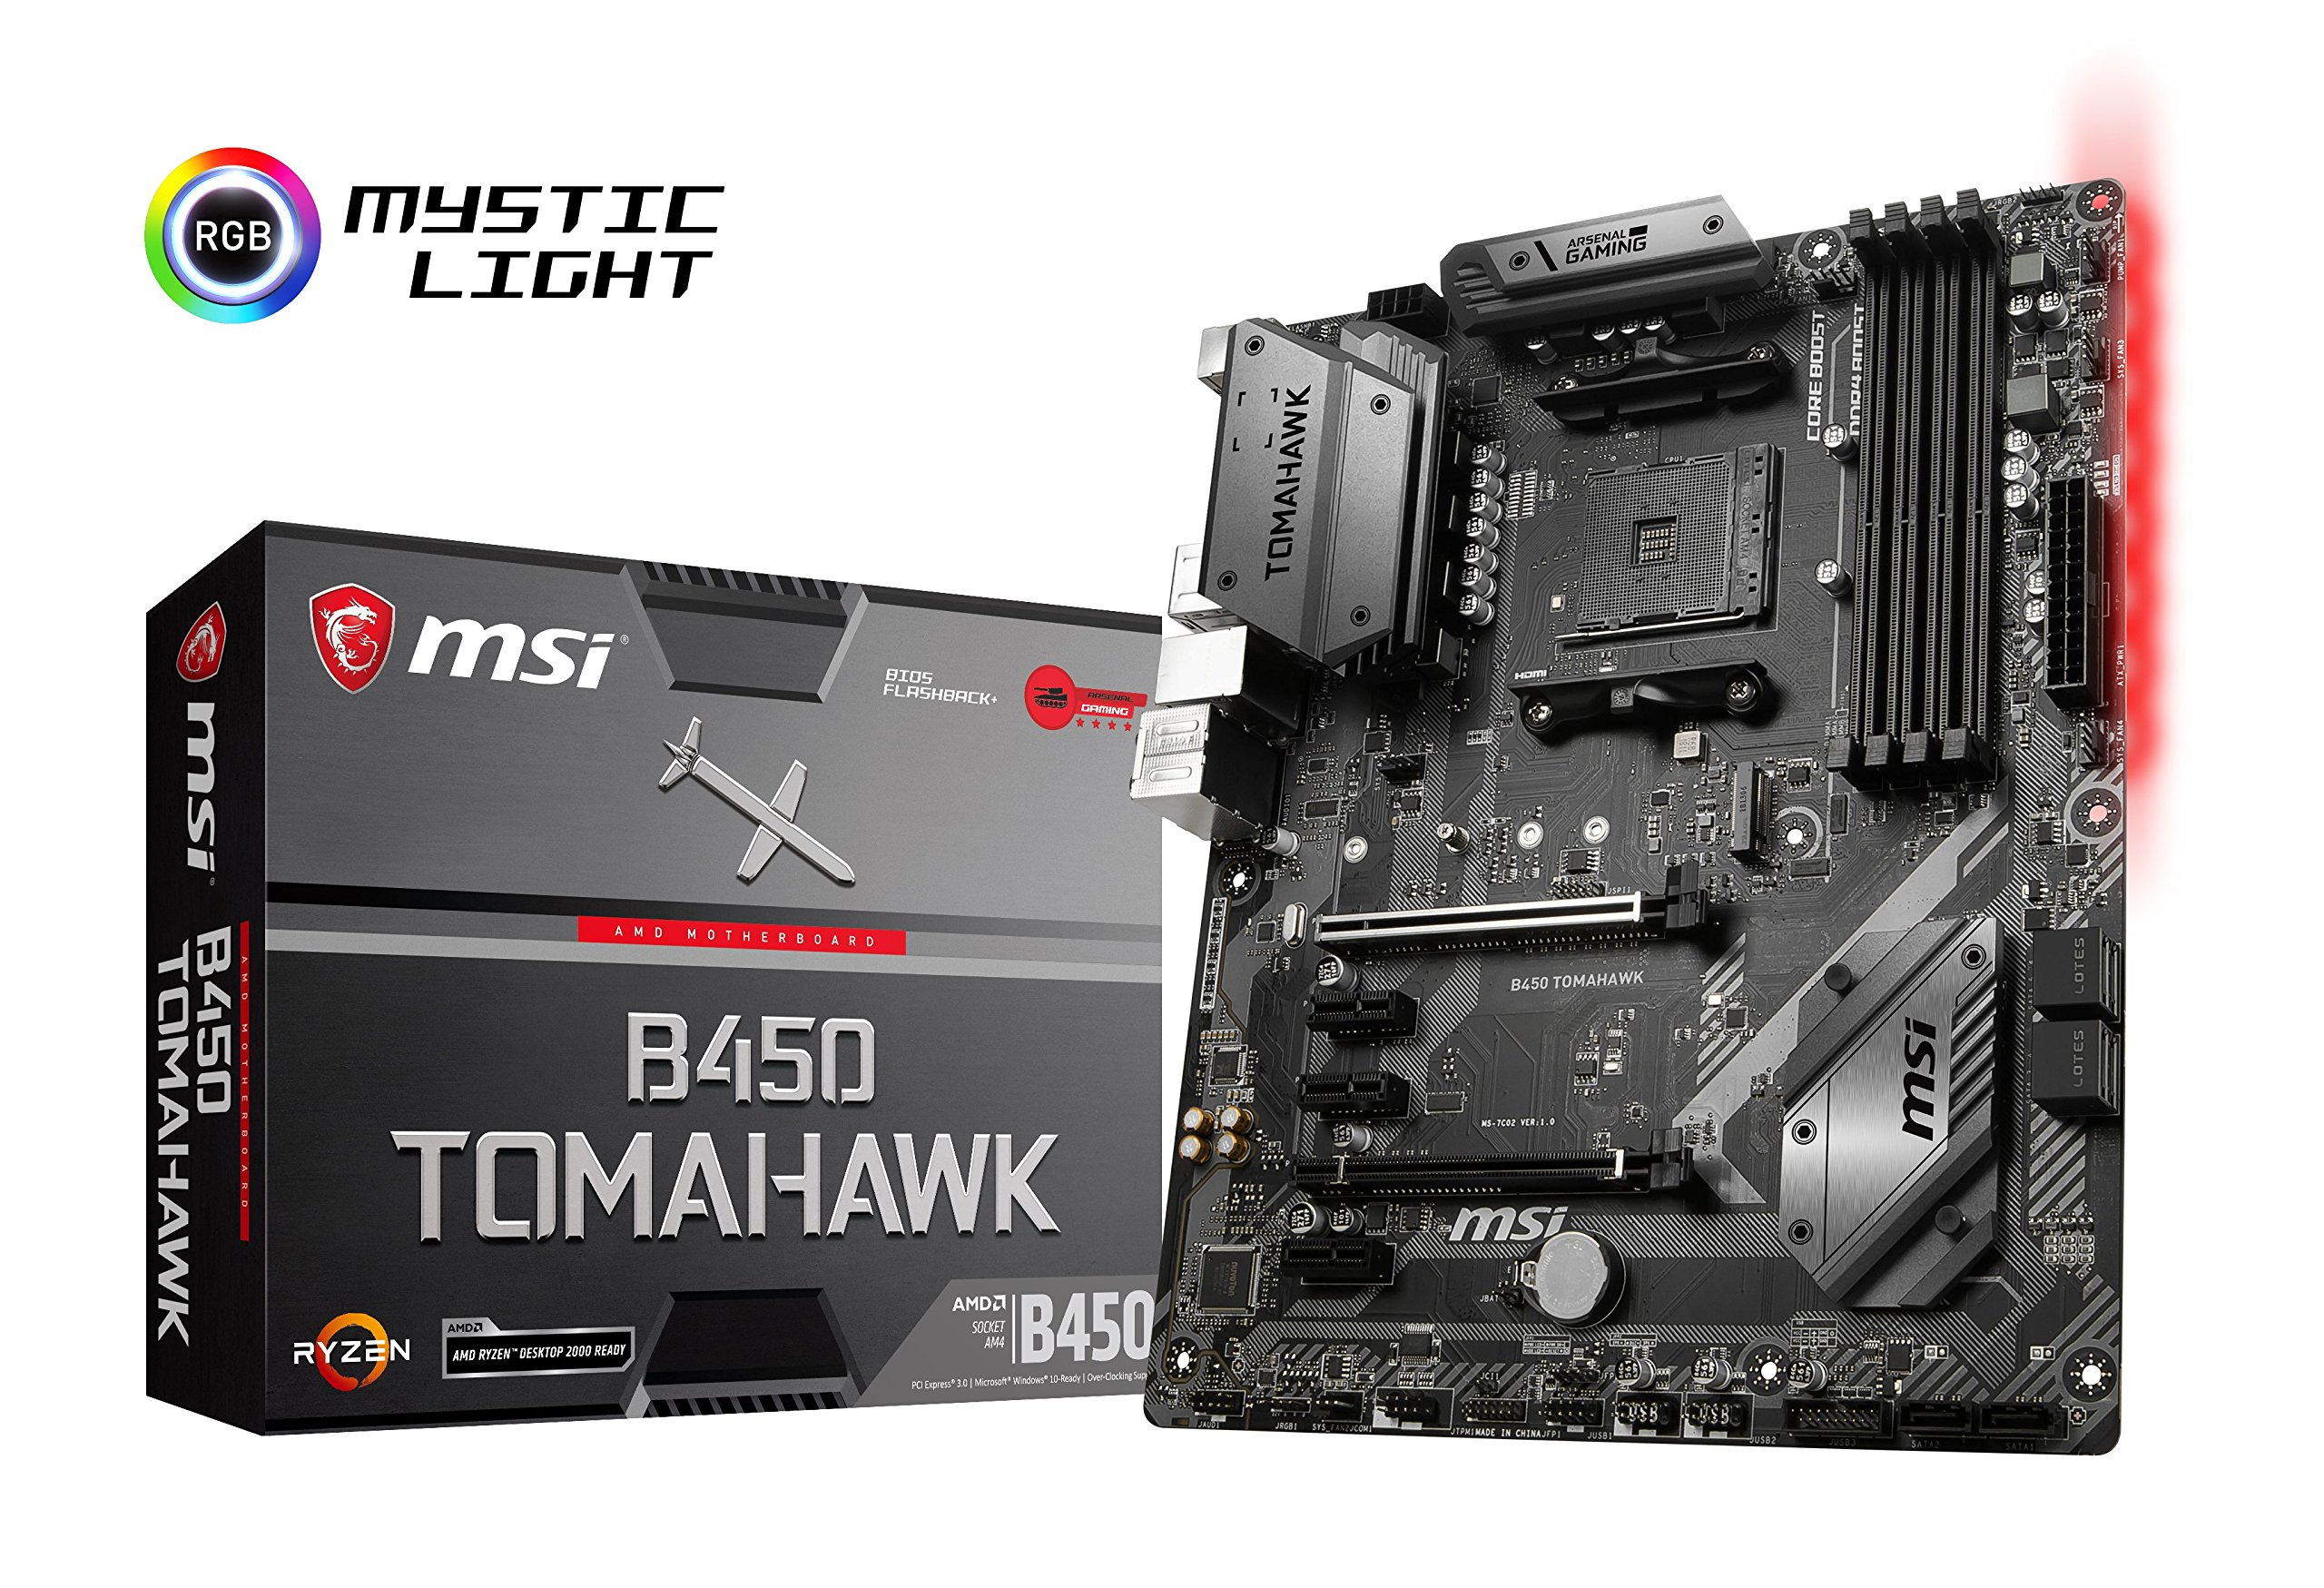 Pack placa base + procesador - Placa base MSI B450 Tomahawk (AM4, AMD B450, DDR4, HMDI), y procesador AMD Ryzen 5 2600X (19 MB, 6 núcleos, 4.25 GhZ, 95 W): Amazon.es: Informática